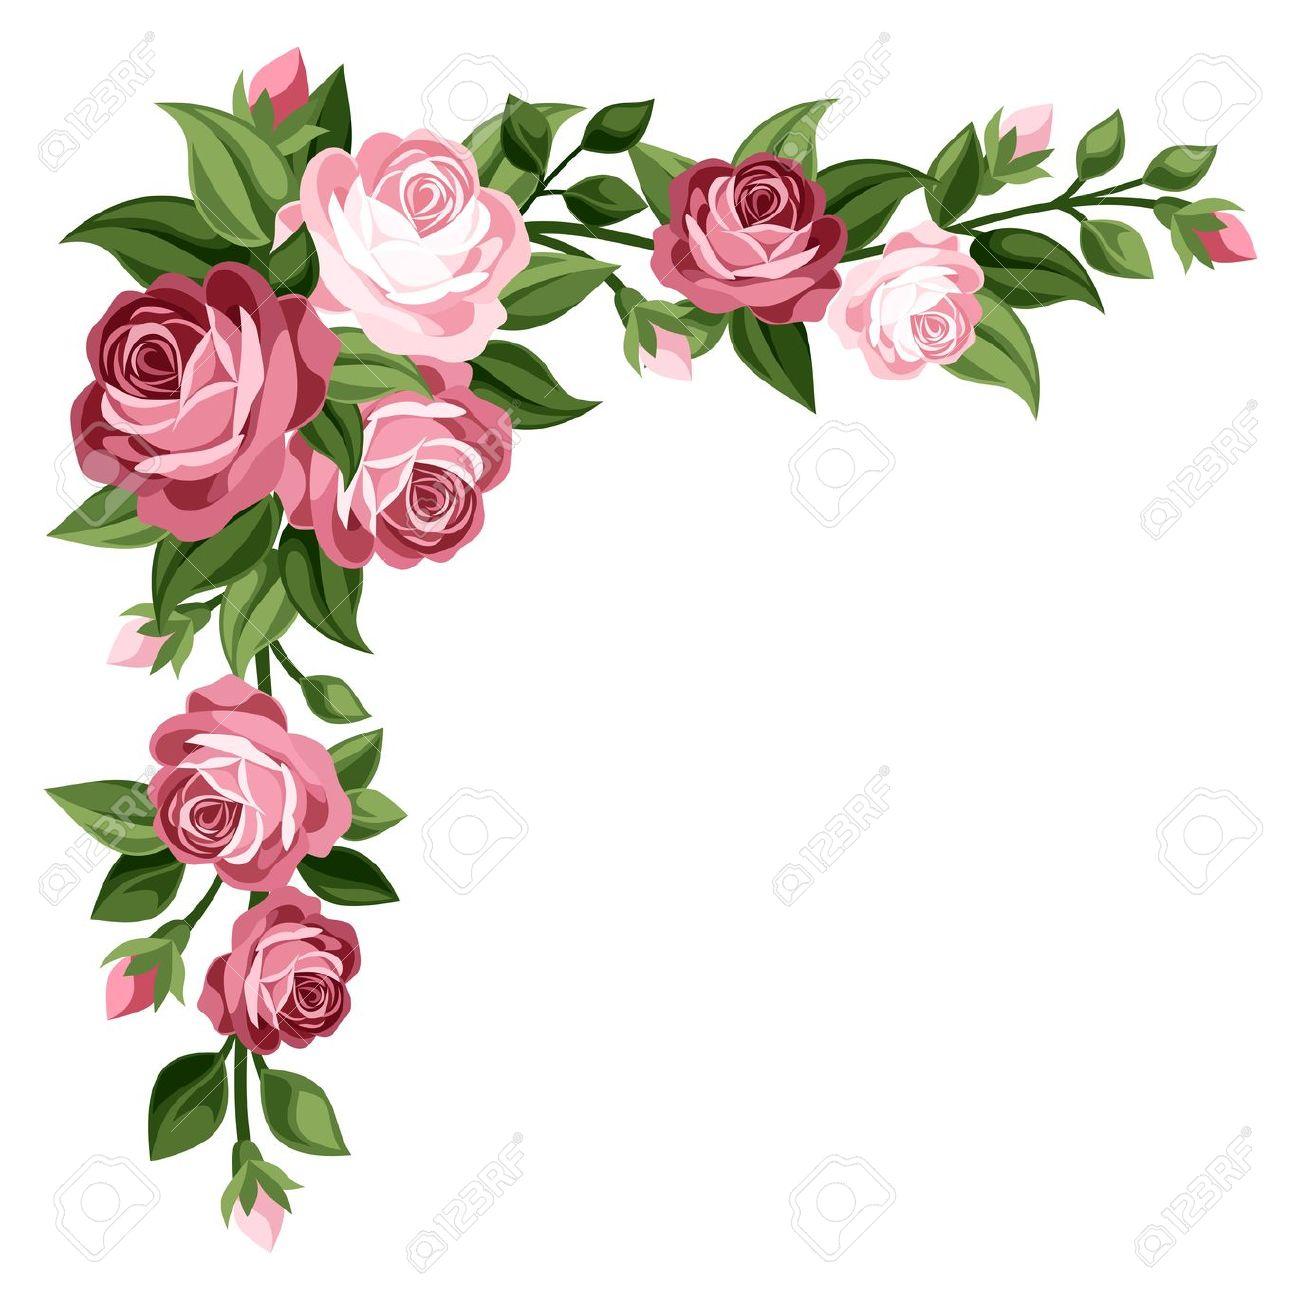 1300x1300 Rose Clipart Rose Border